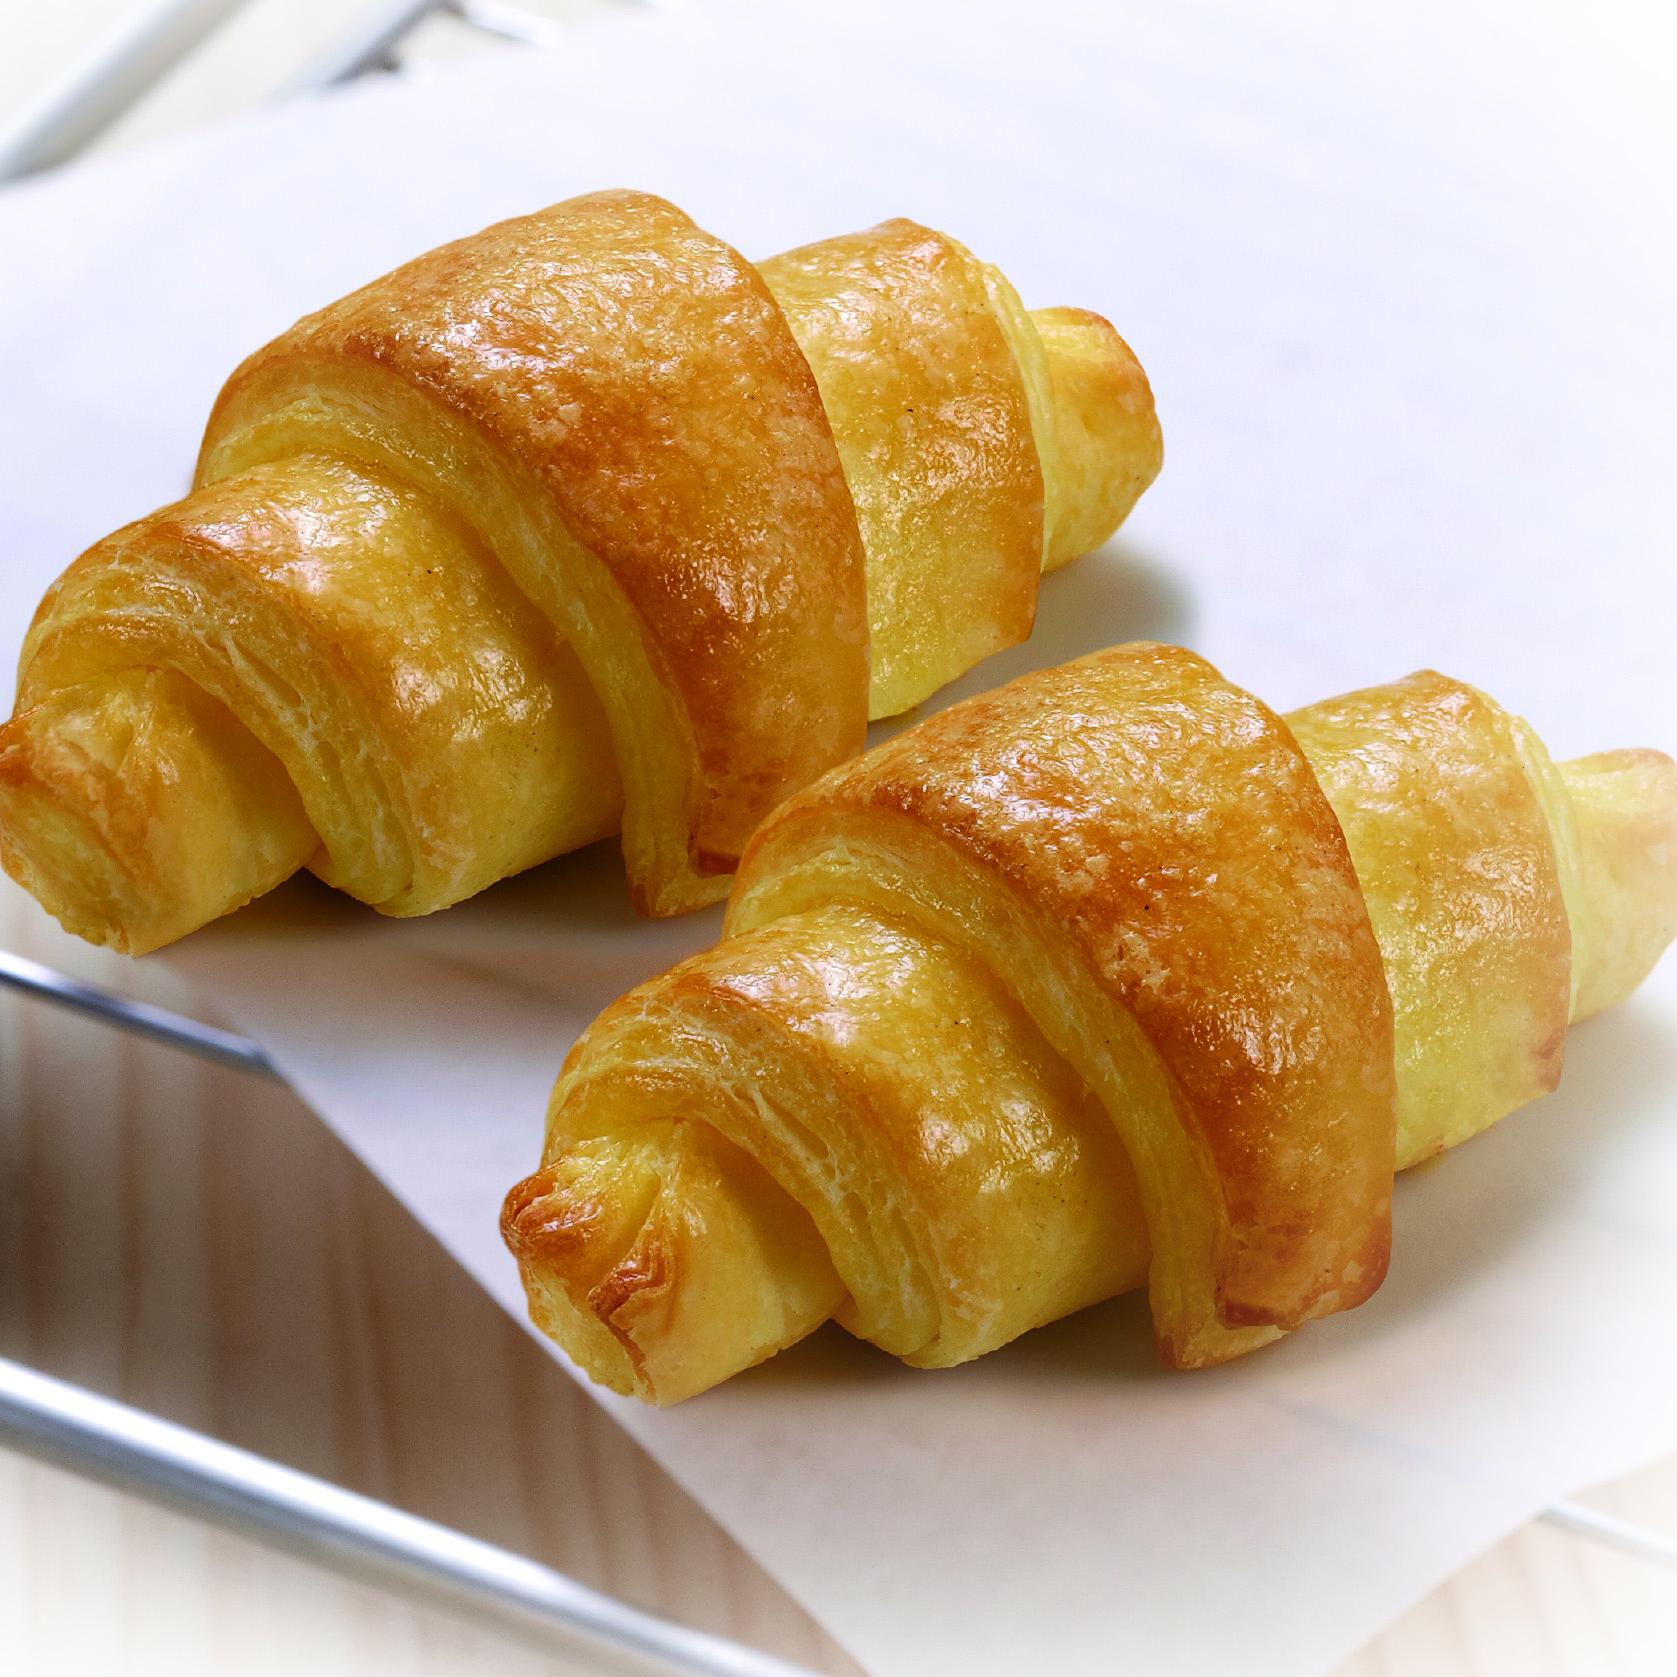 Croissant sin gluten de Proceli listo para hornear